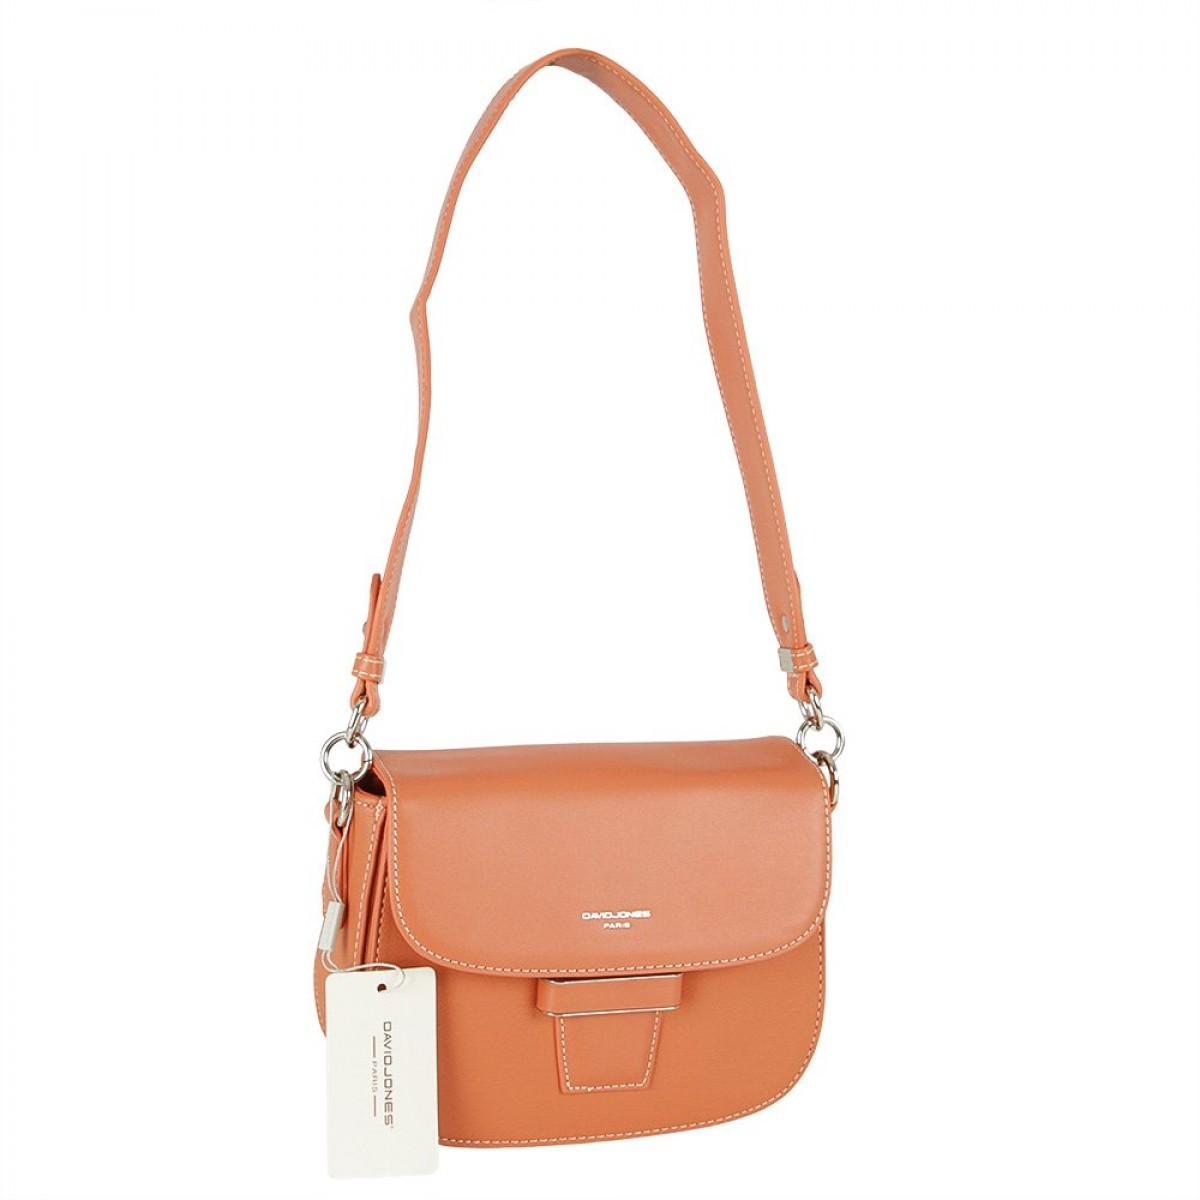 Жіноча сумка David Jones 6211-1 CORAL